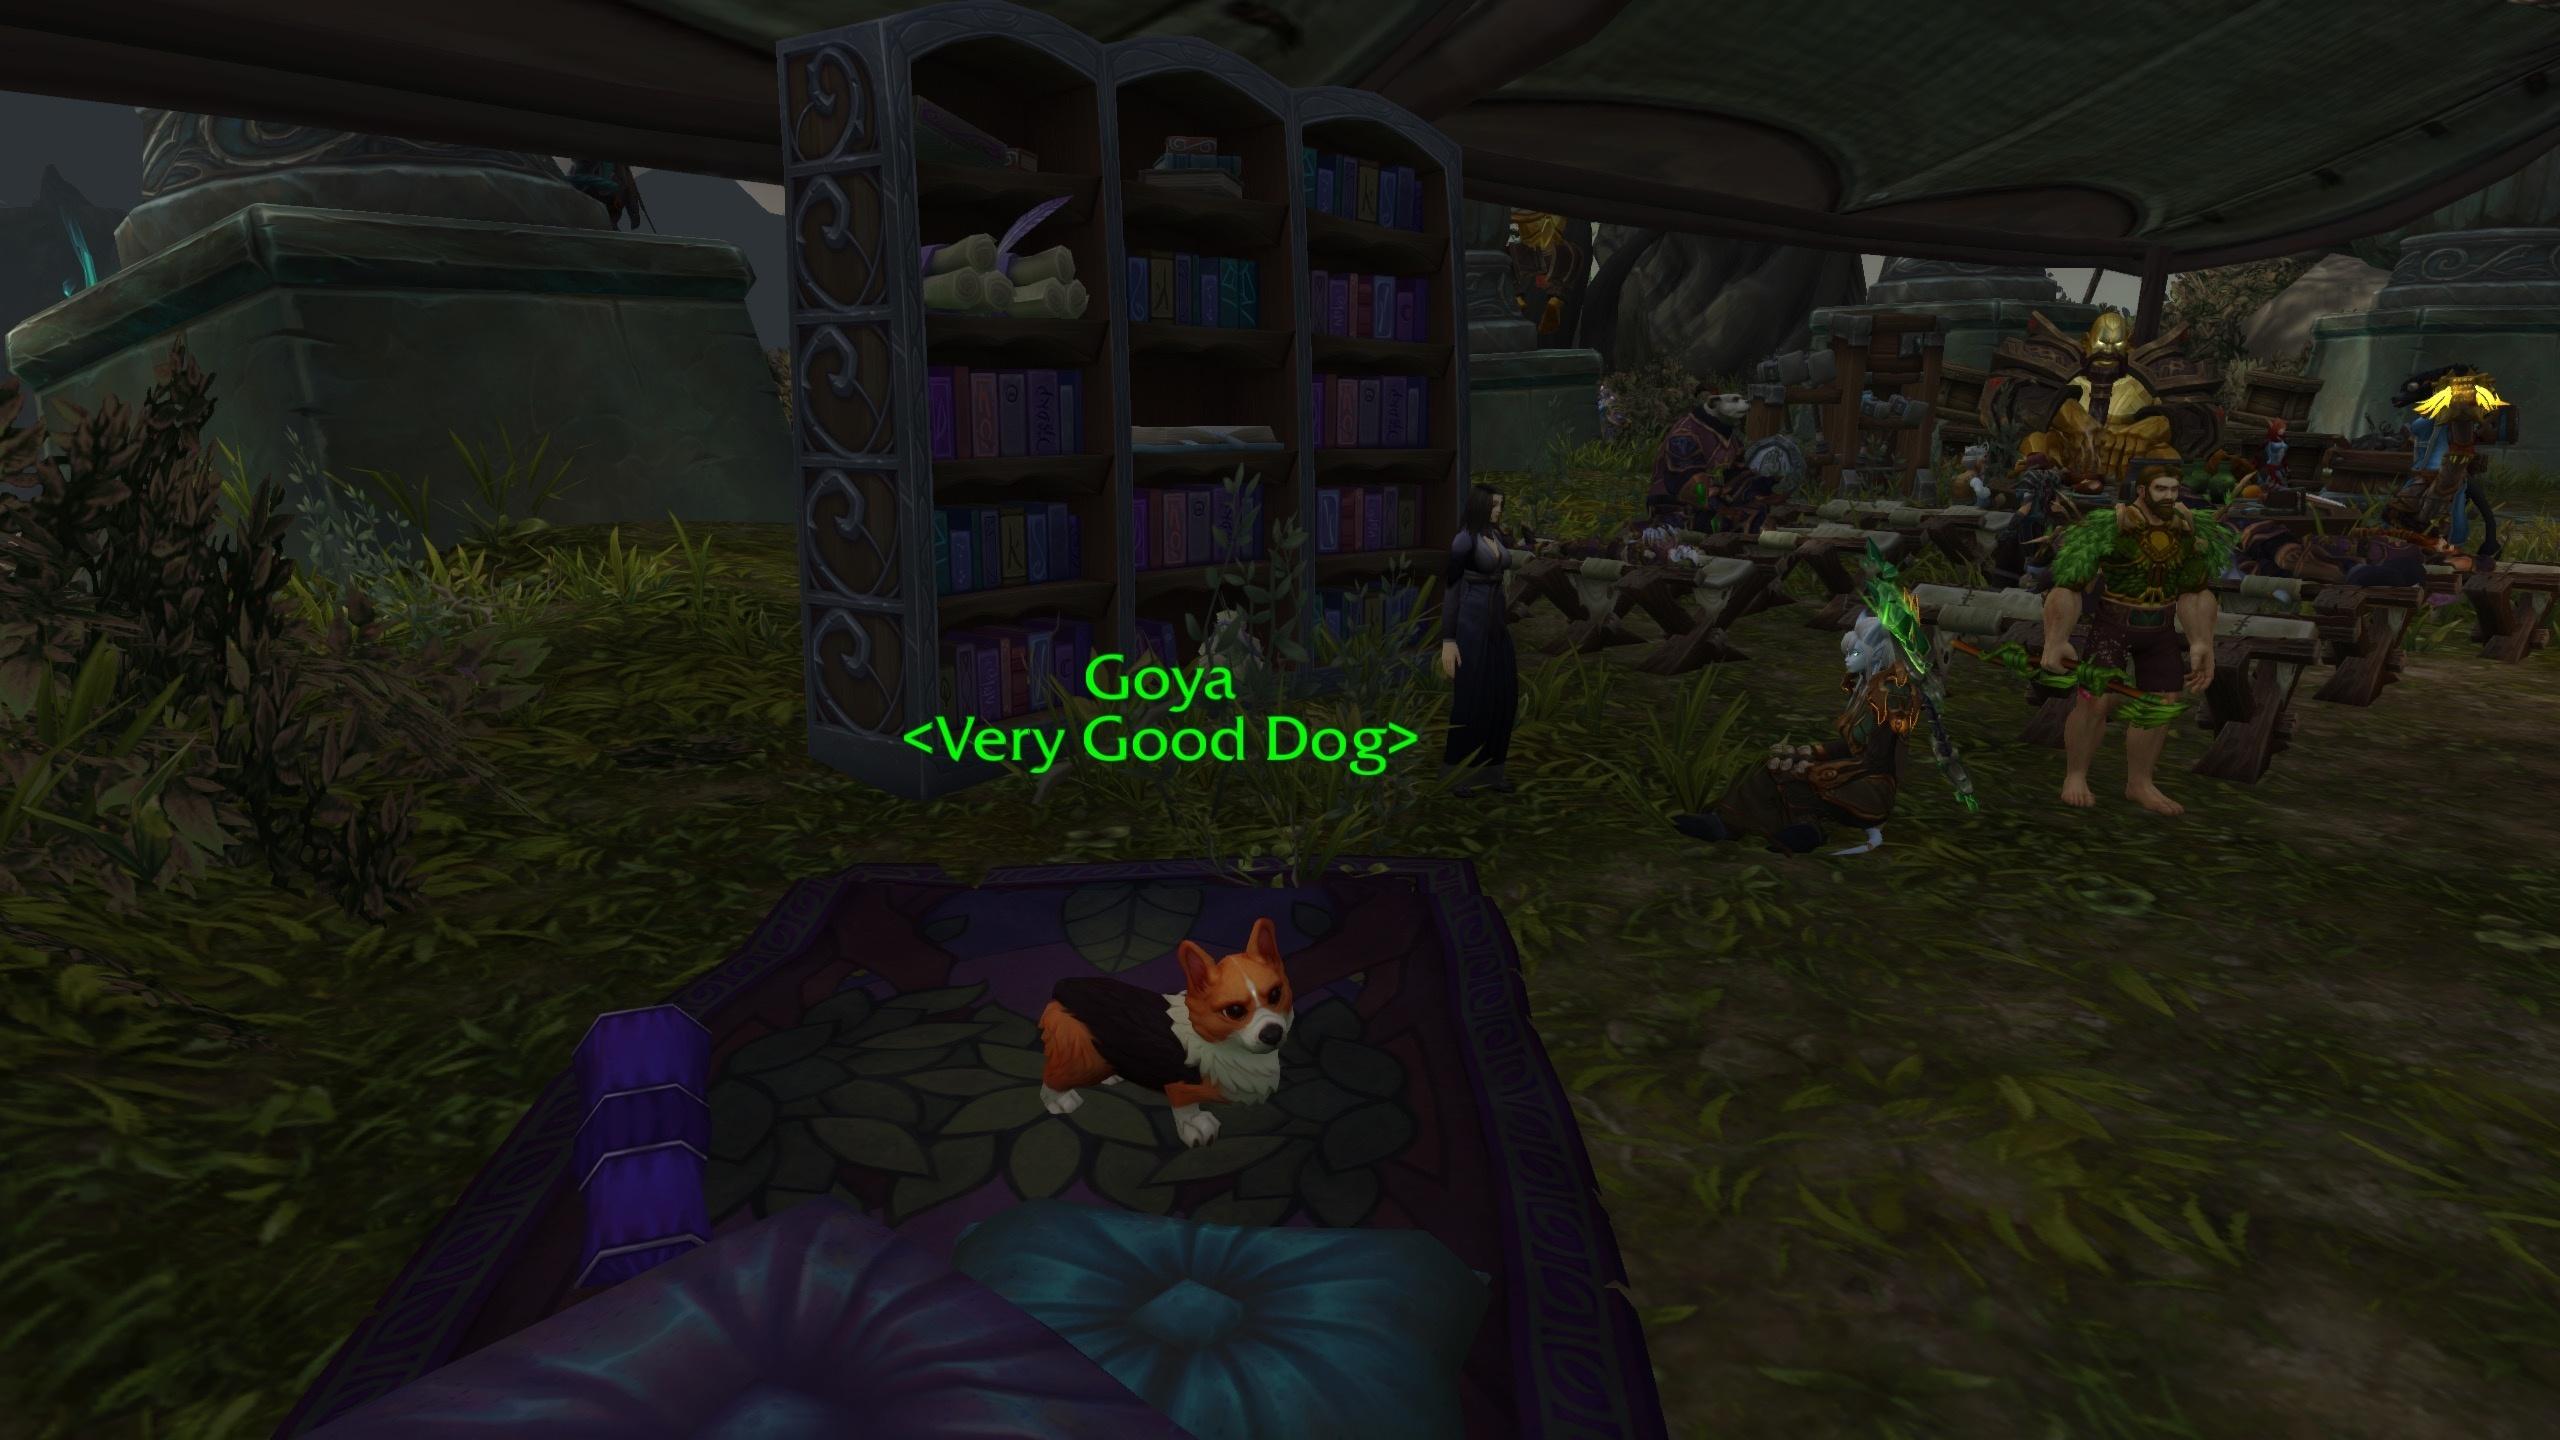 Goya The Very Good Dog